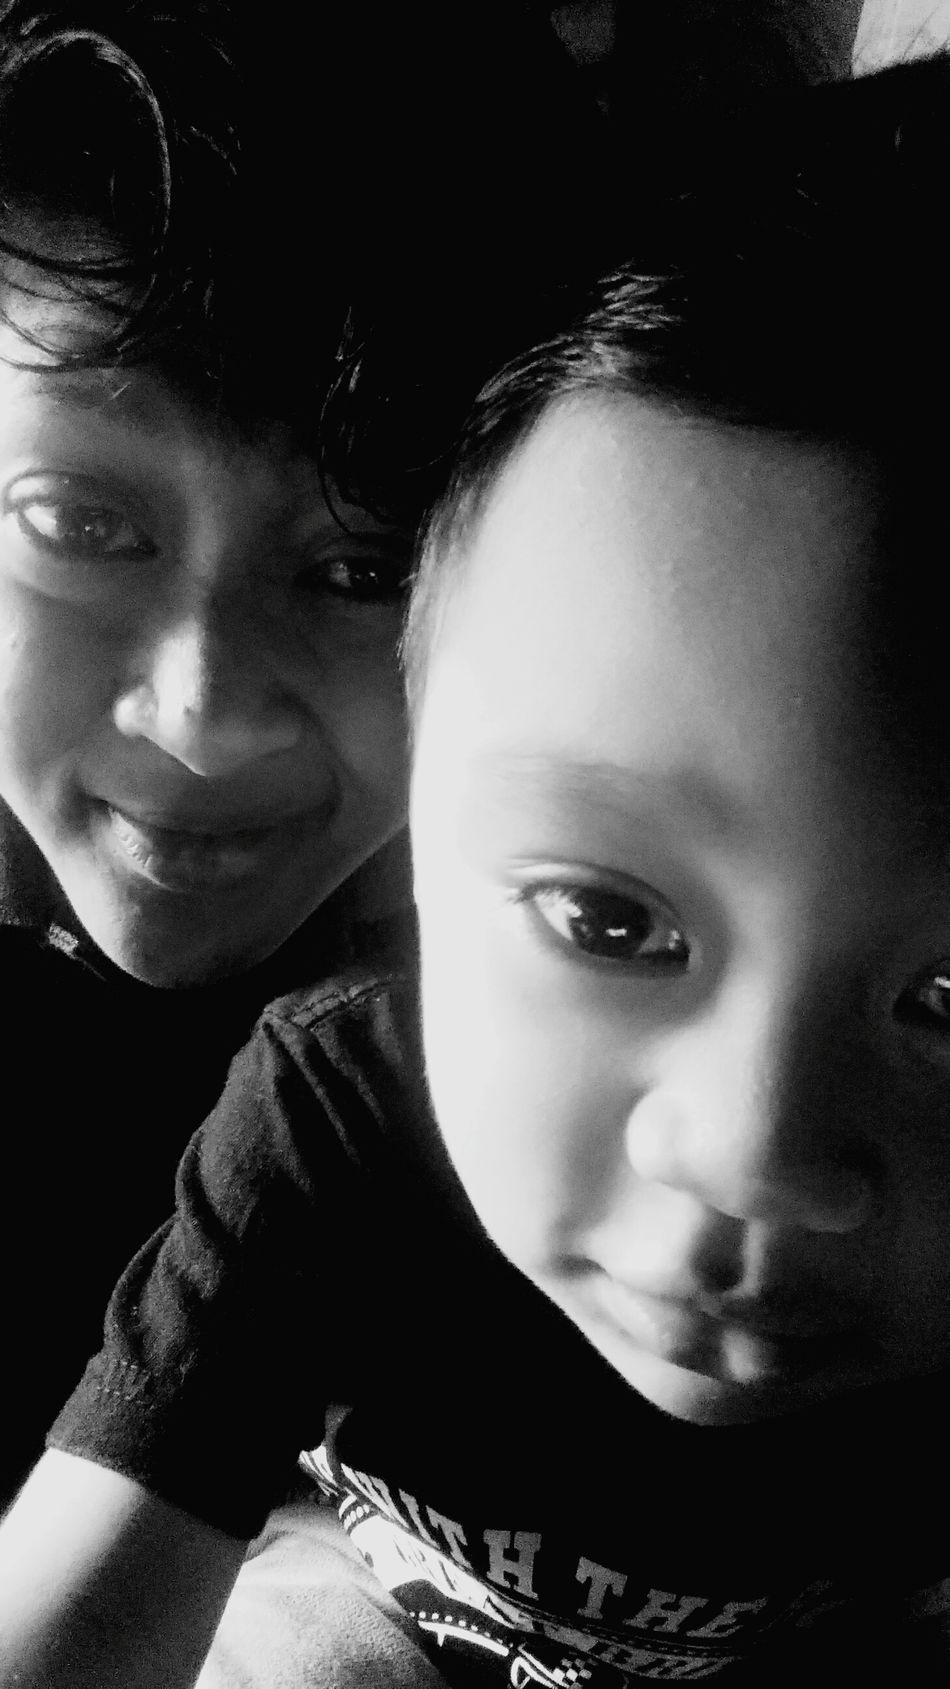 Babyboy Boys Blackandwhite Blackandwhite Photography Mom And Son Mommy & Baby Time <3 Enjoying The Moment Photokeyent Happy Time Enjoying Life